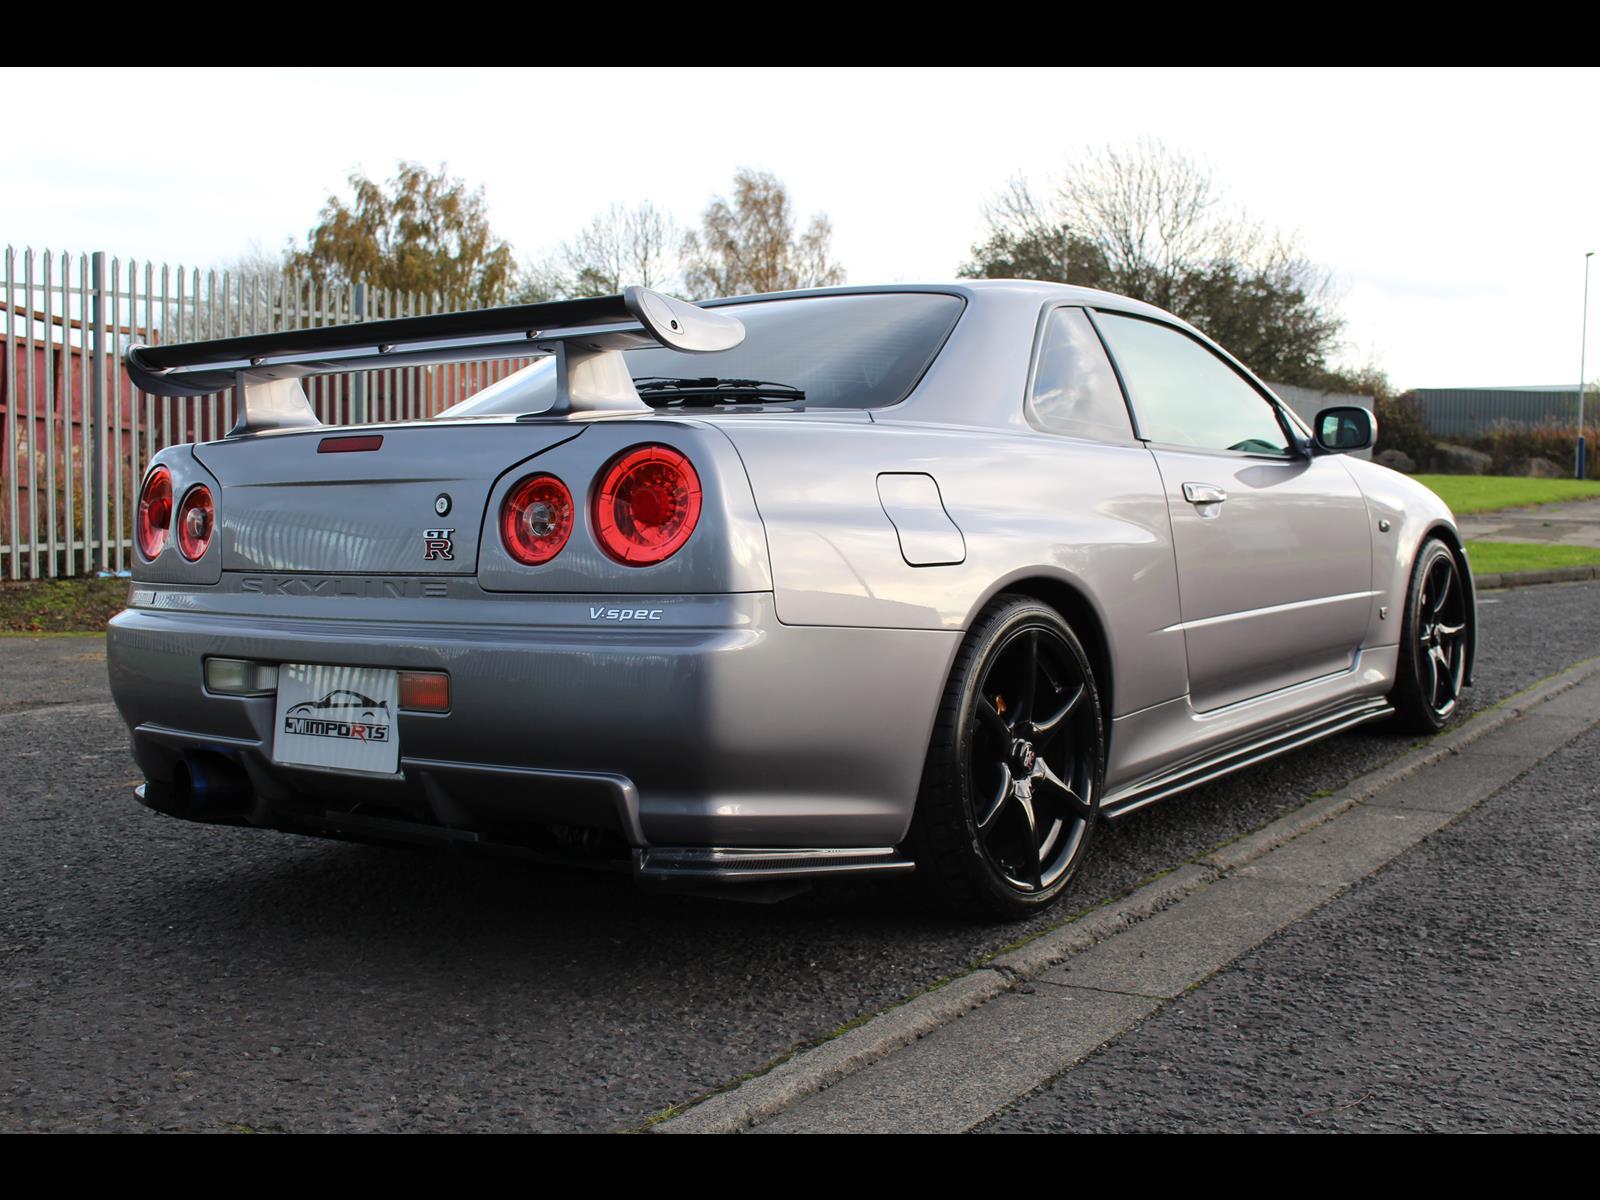 2002 Nissan Skyline R34 GTR V-Spec 650 Bhp UK Model Number ...